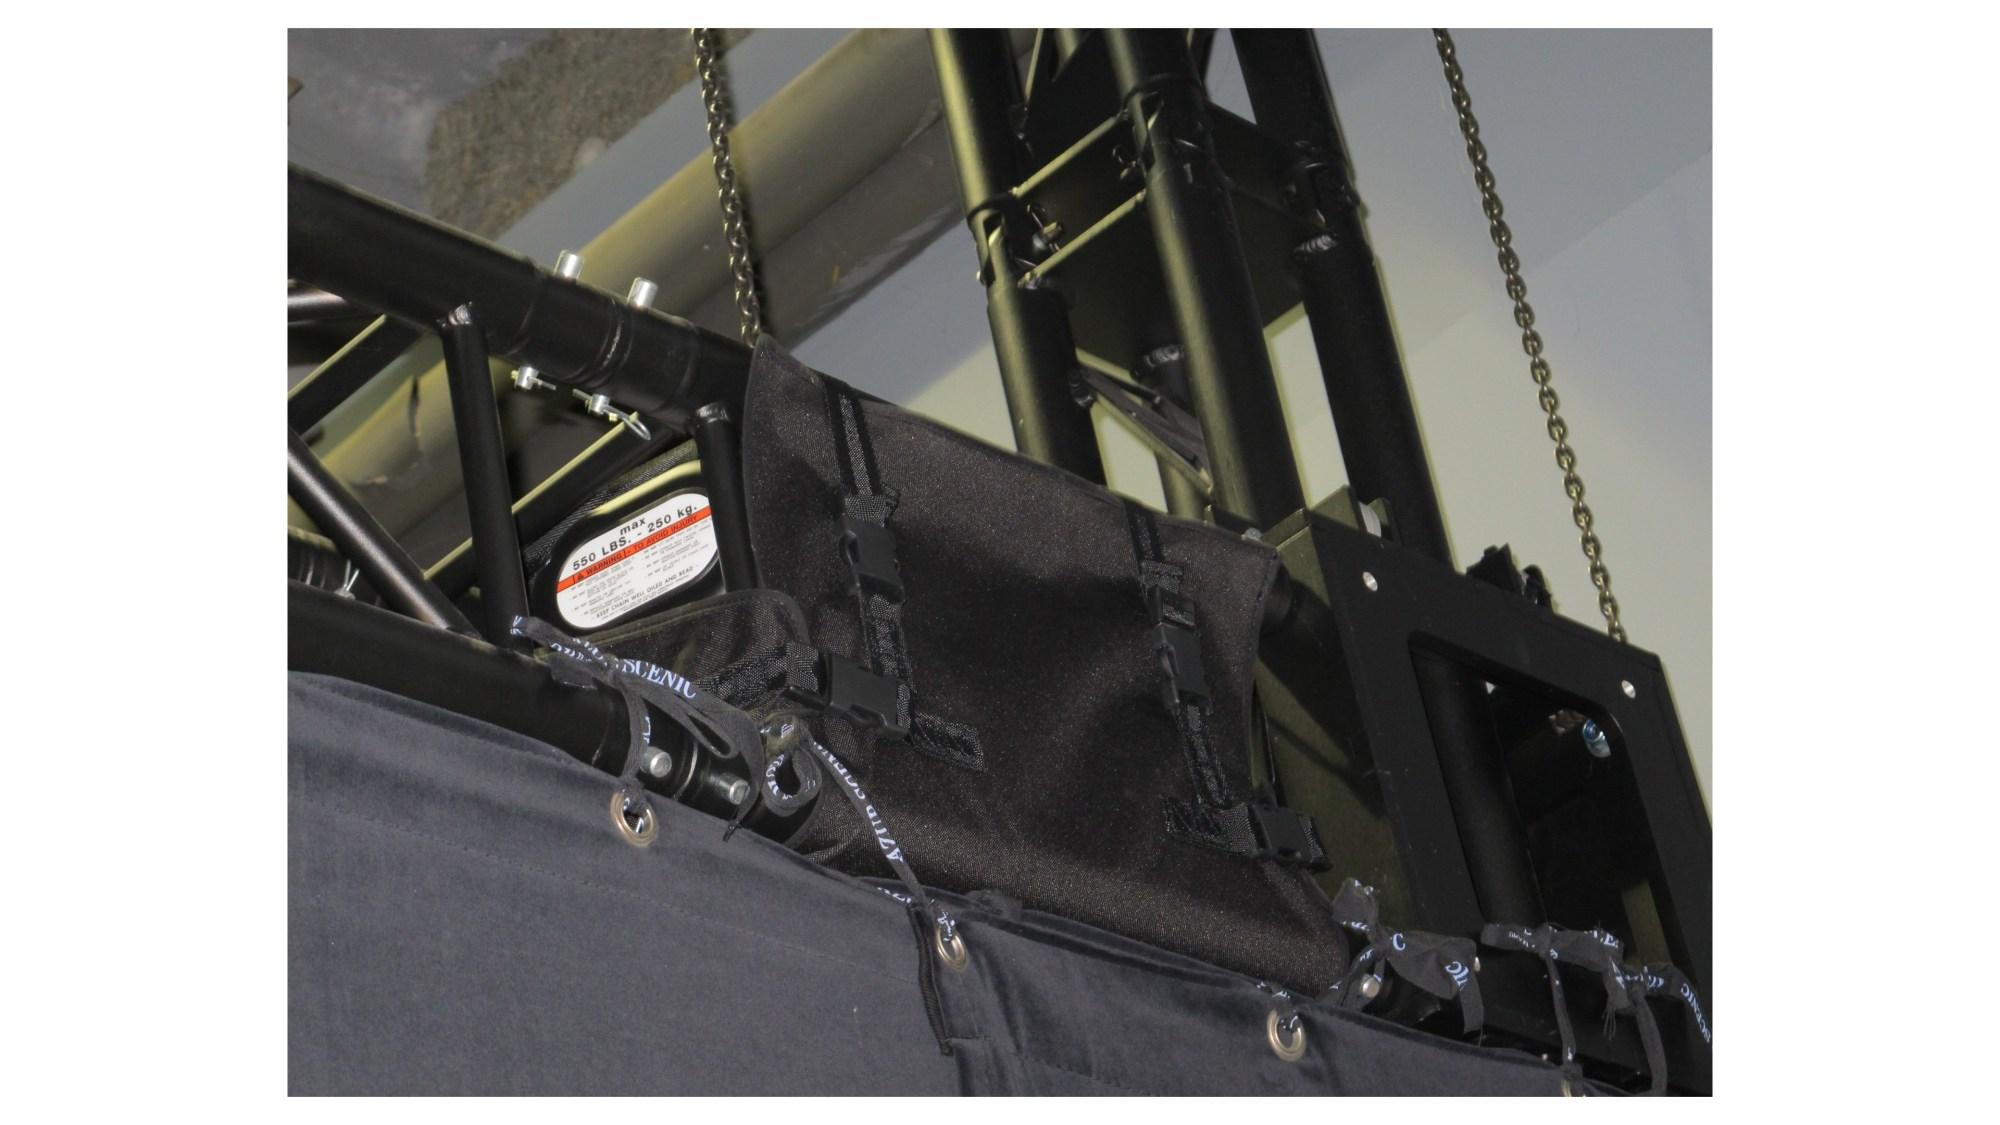 hight resolution of  cm prostar 250 kg electric chain hoist cm lodestar hoist lb wiring diagram on